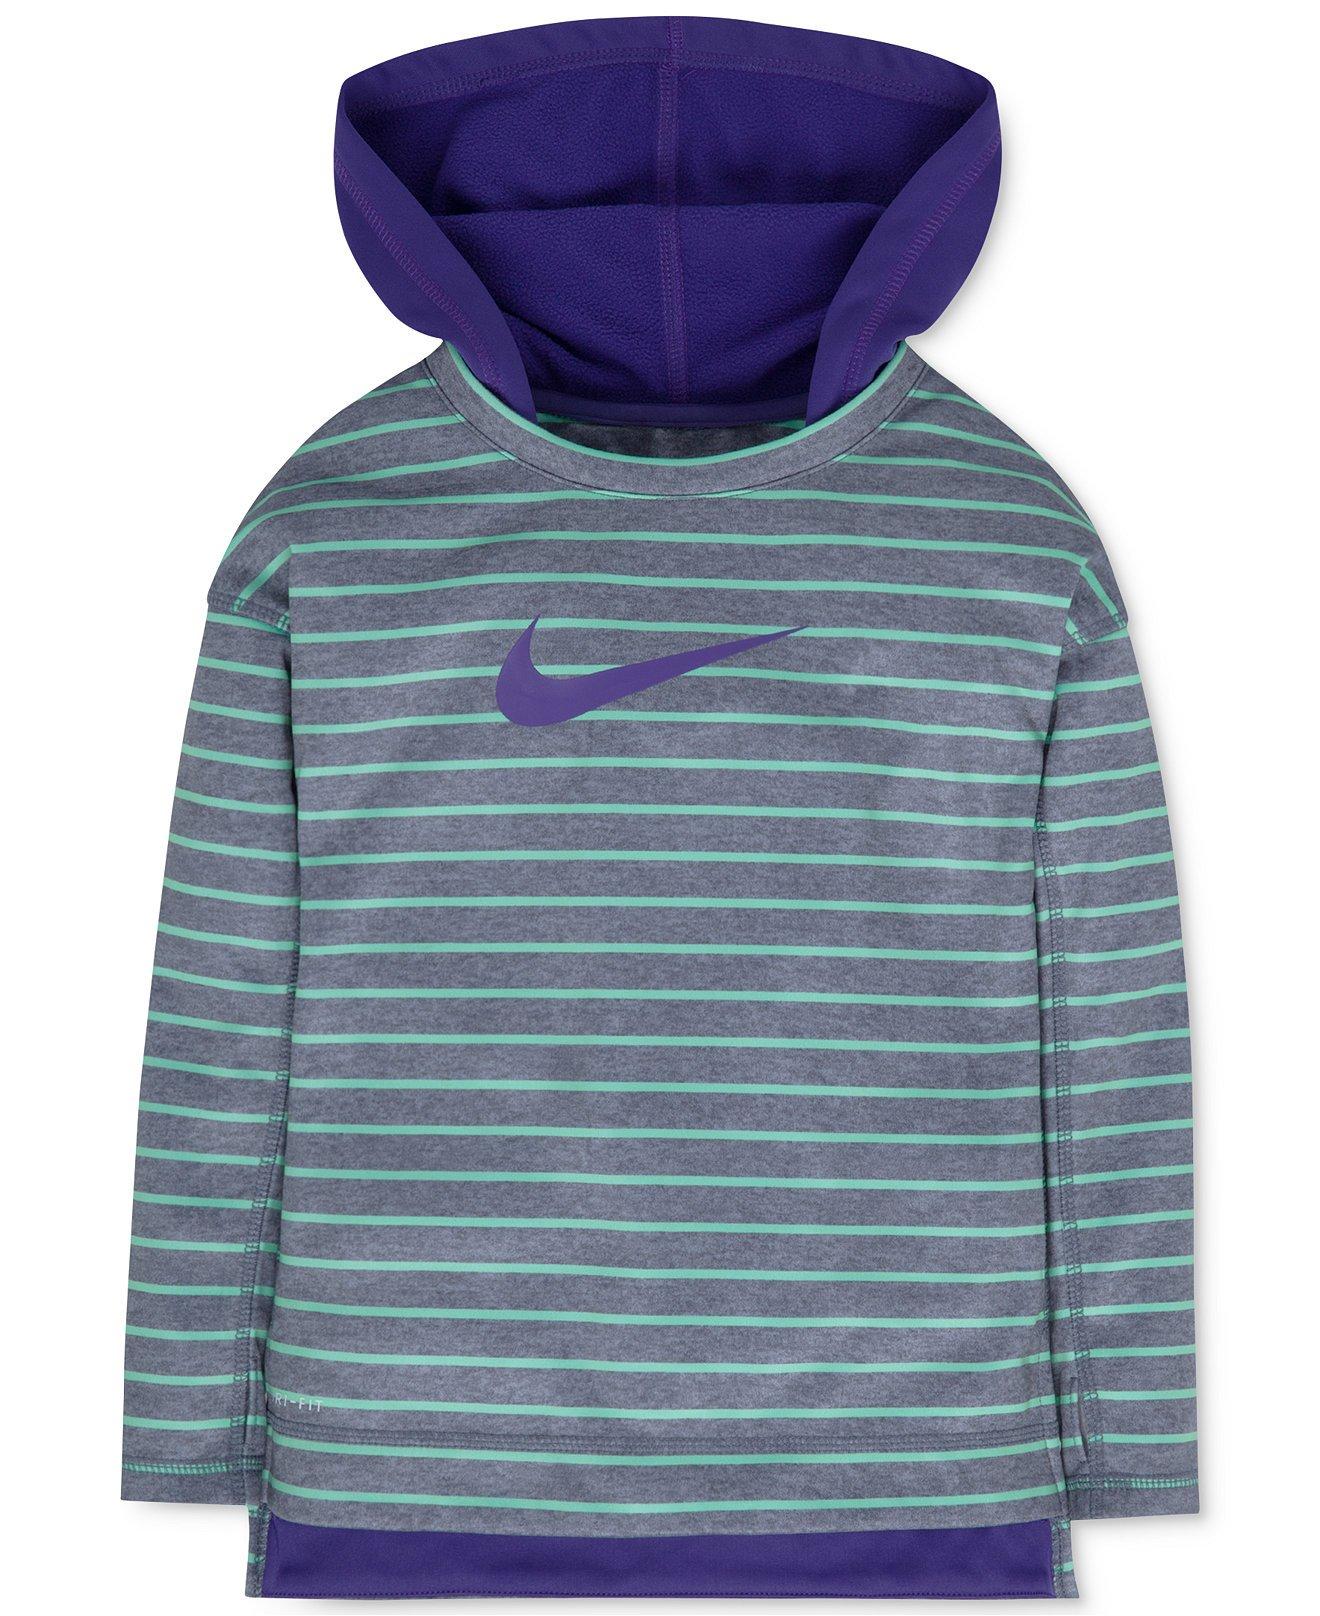 Nike Girl Striped Hoodie Size 5 Dark Iris